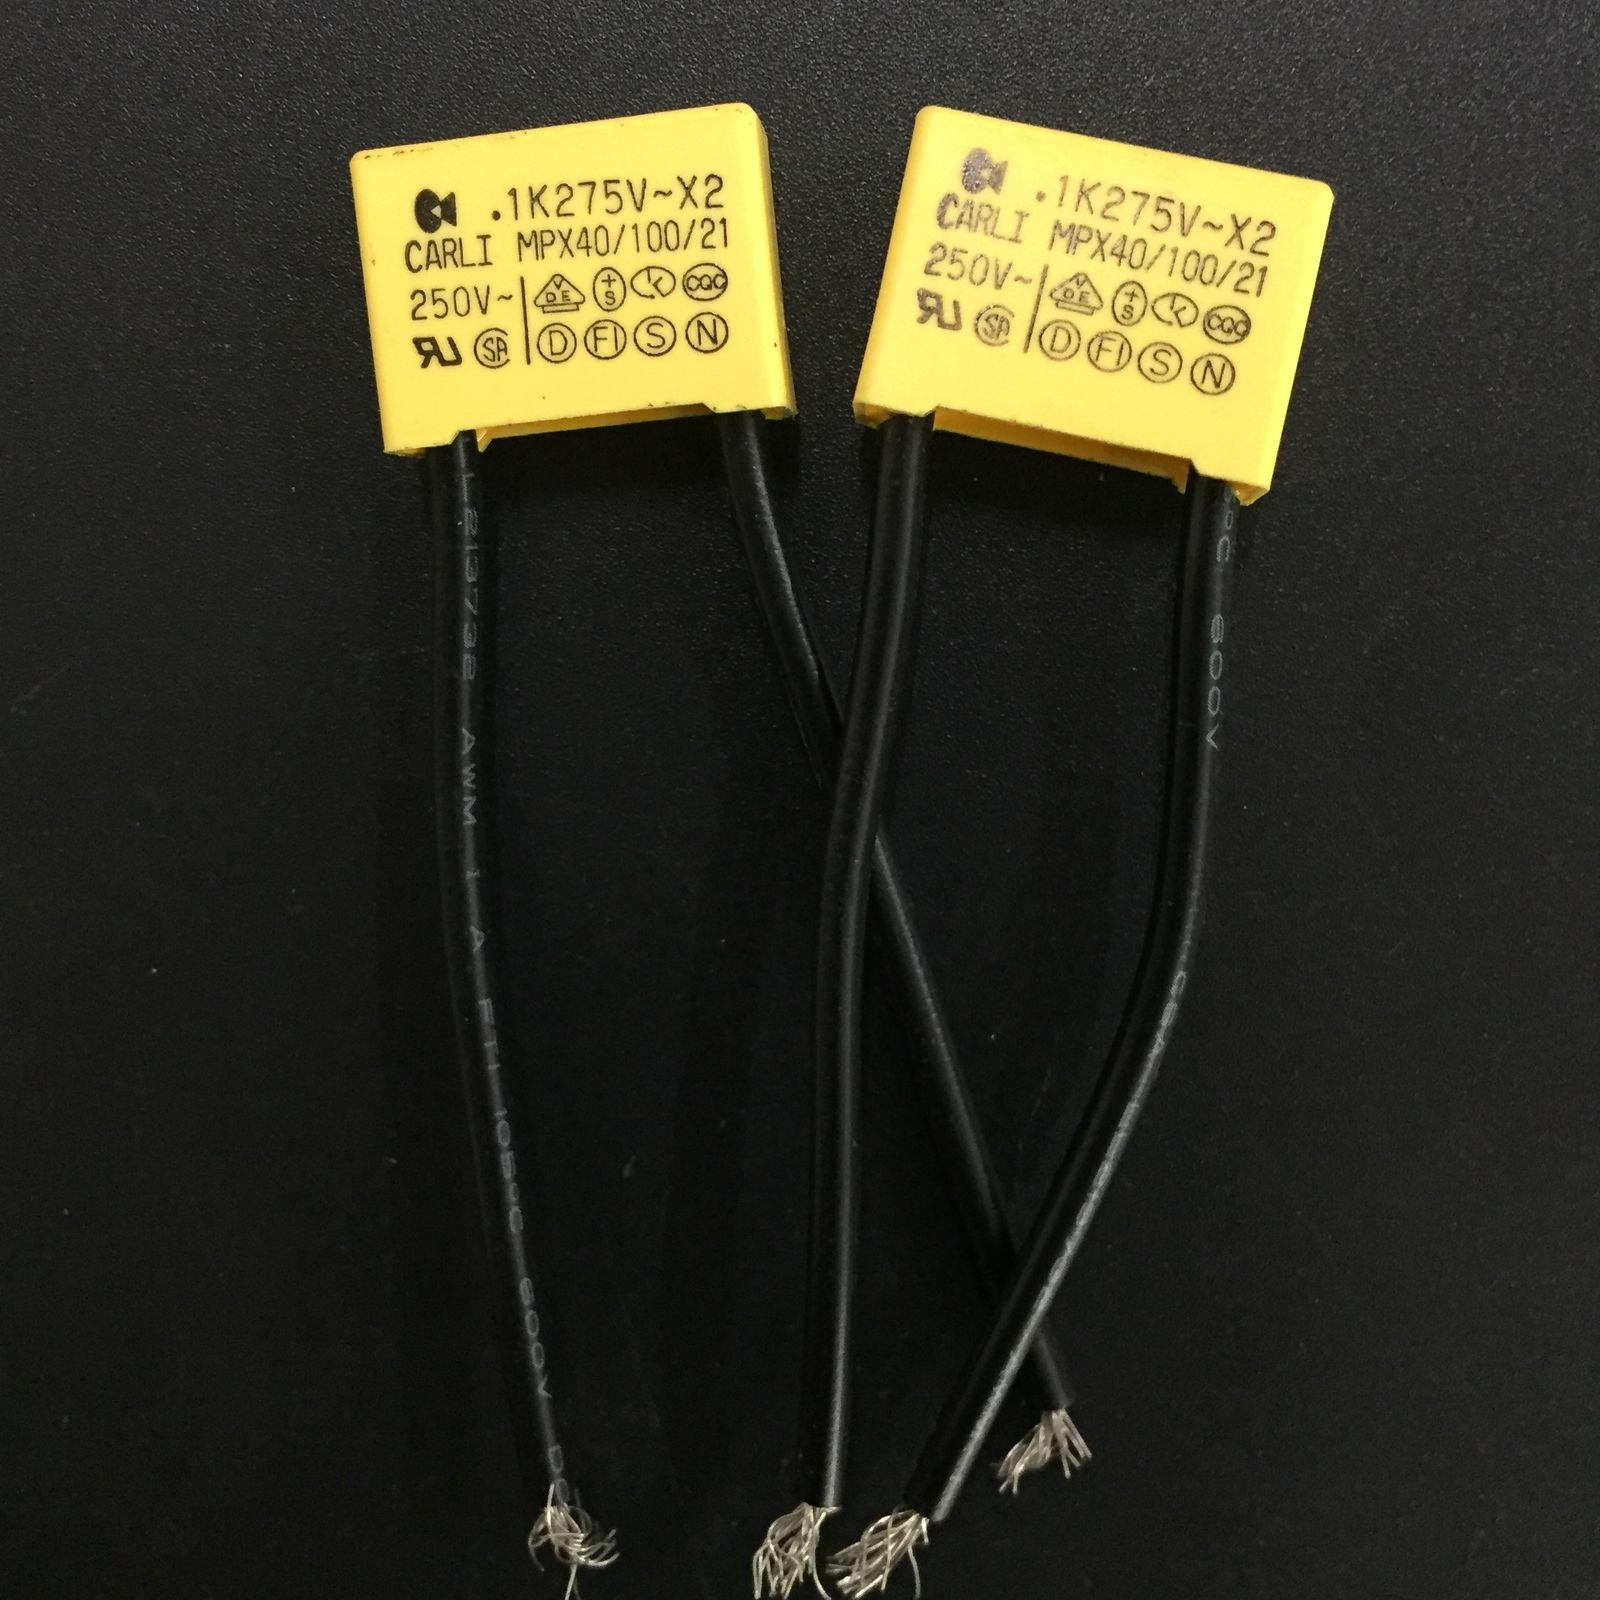 10pcs 275VAC 275V 684K 684 0.68uF 474K 474 0.47uF 224K 224 0.22uF 154K 154 0.15uF 104K 104 0.1uF X2 Safety Capacitors